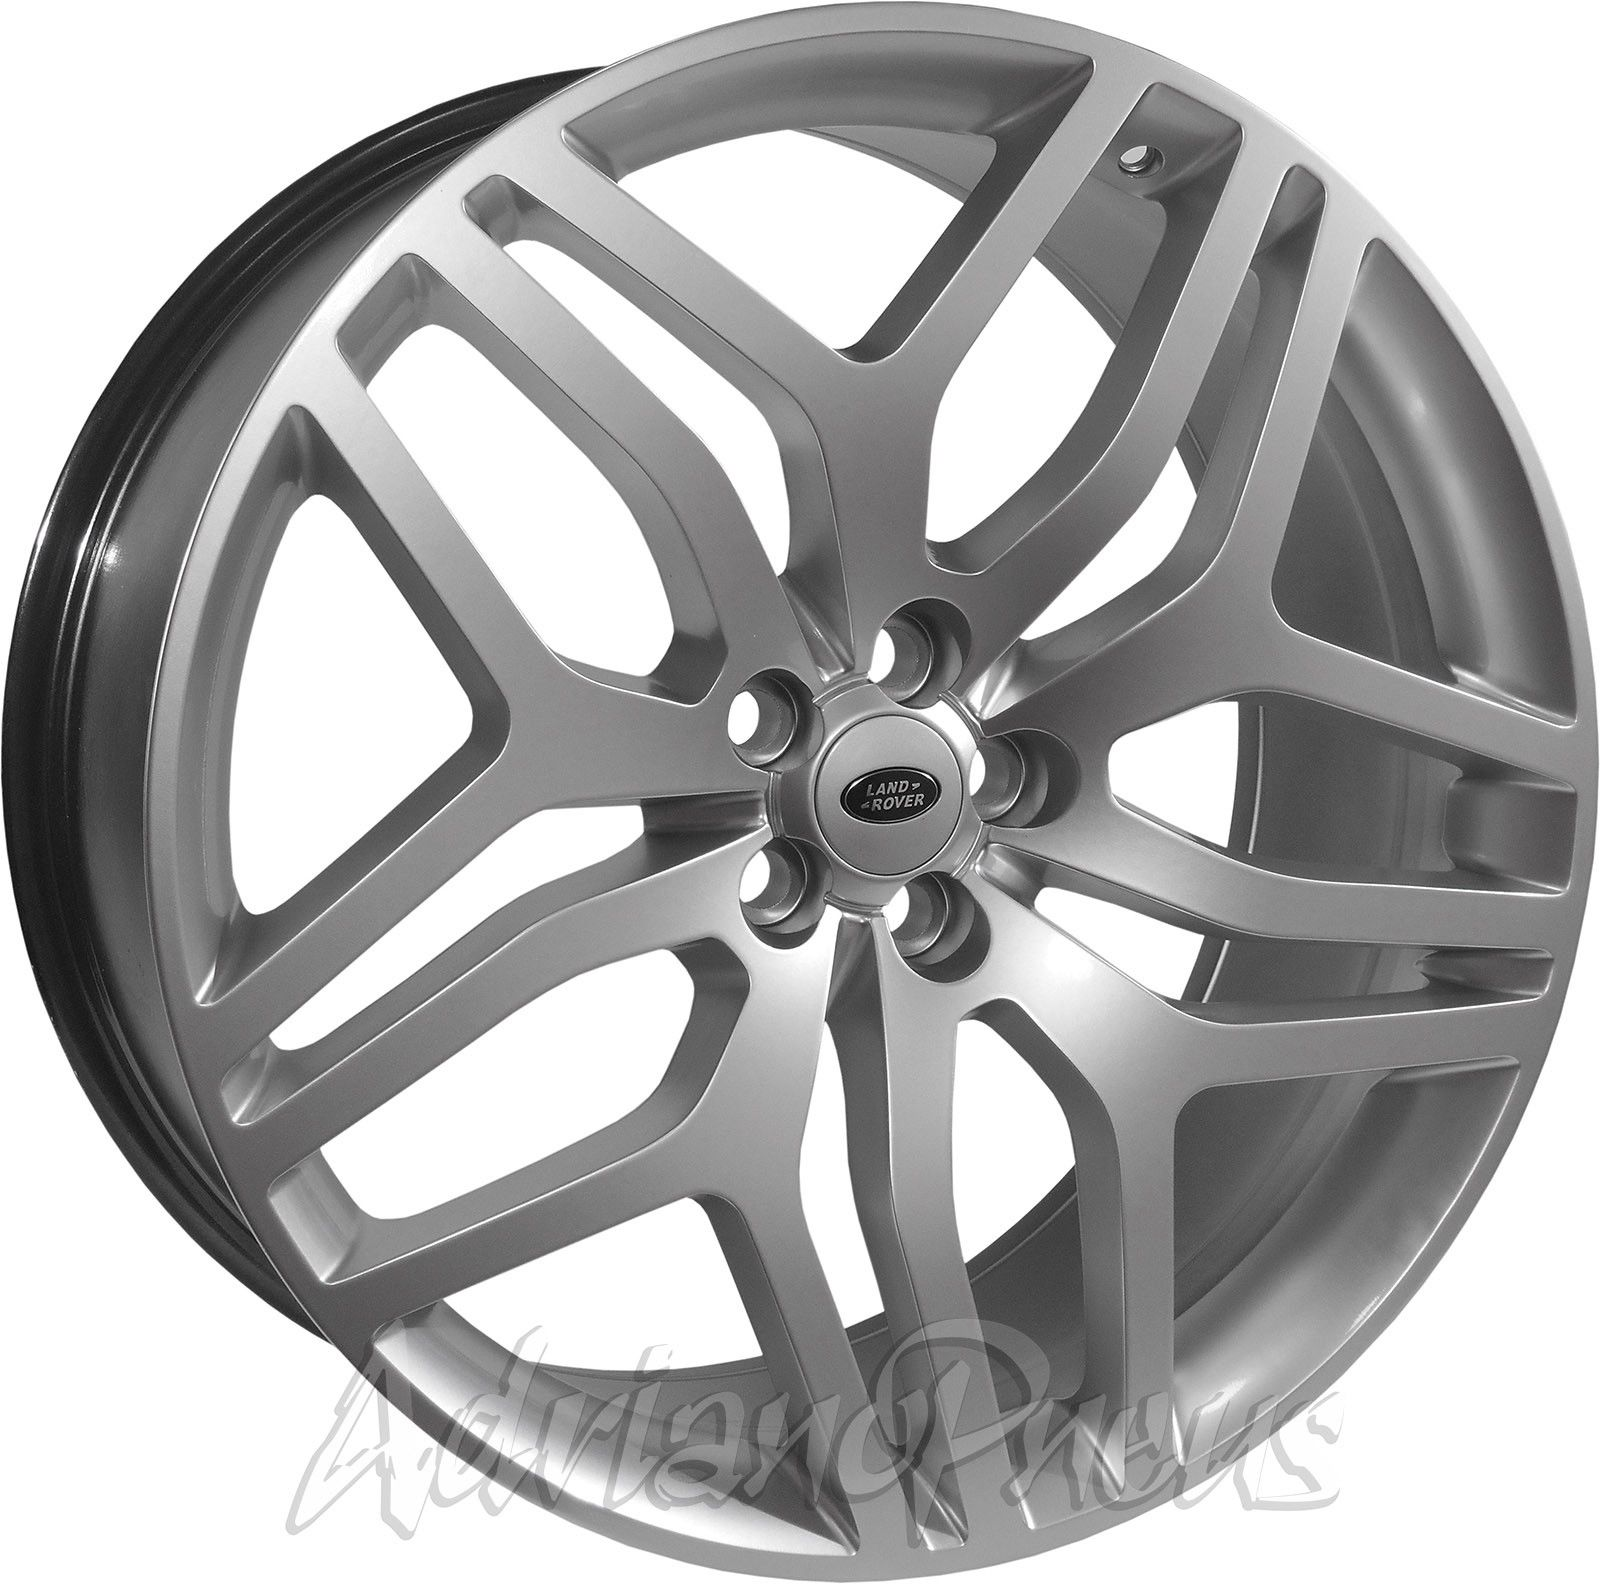 Jogo 4 rodas Zeus 5322 Land Rover Conceito aro 22 tala 9,5 furacão 5X108 acabamento silver ET 48